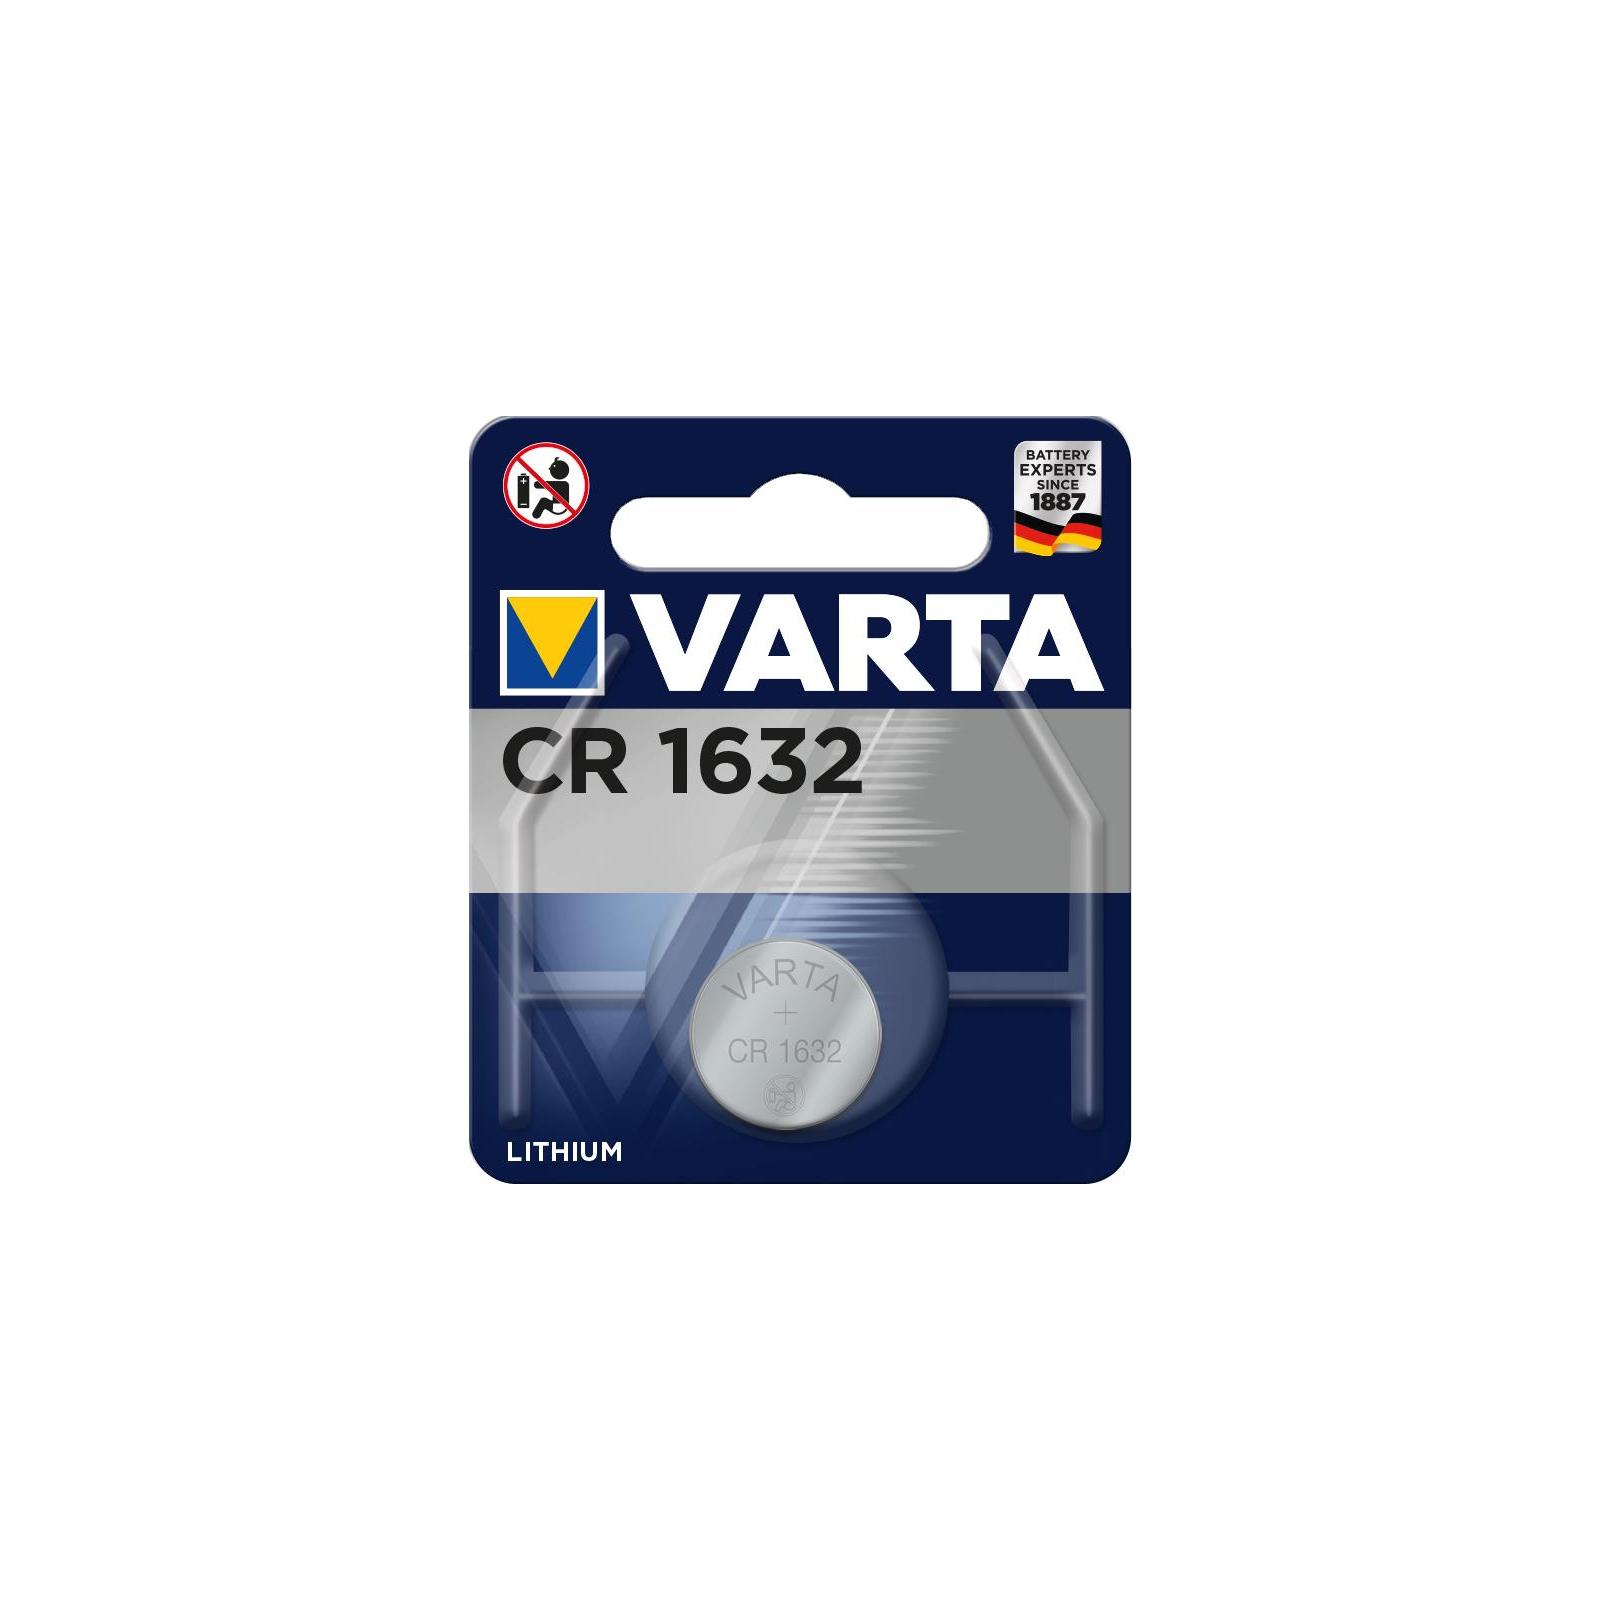 Батарейка Varta VARTA CR 1632 BLI 1 LITHIUM (06632101401)